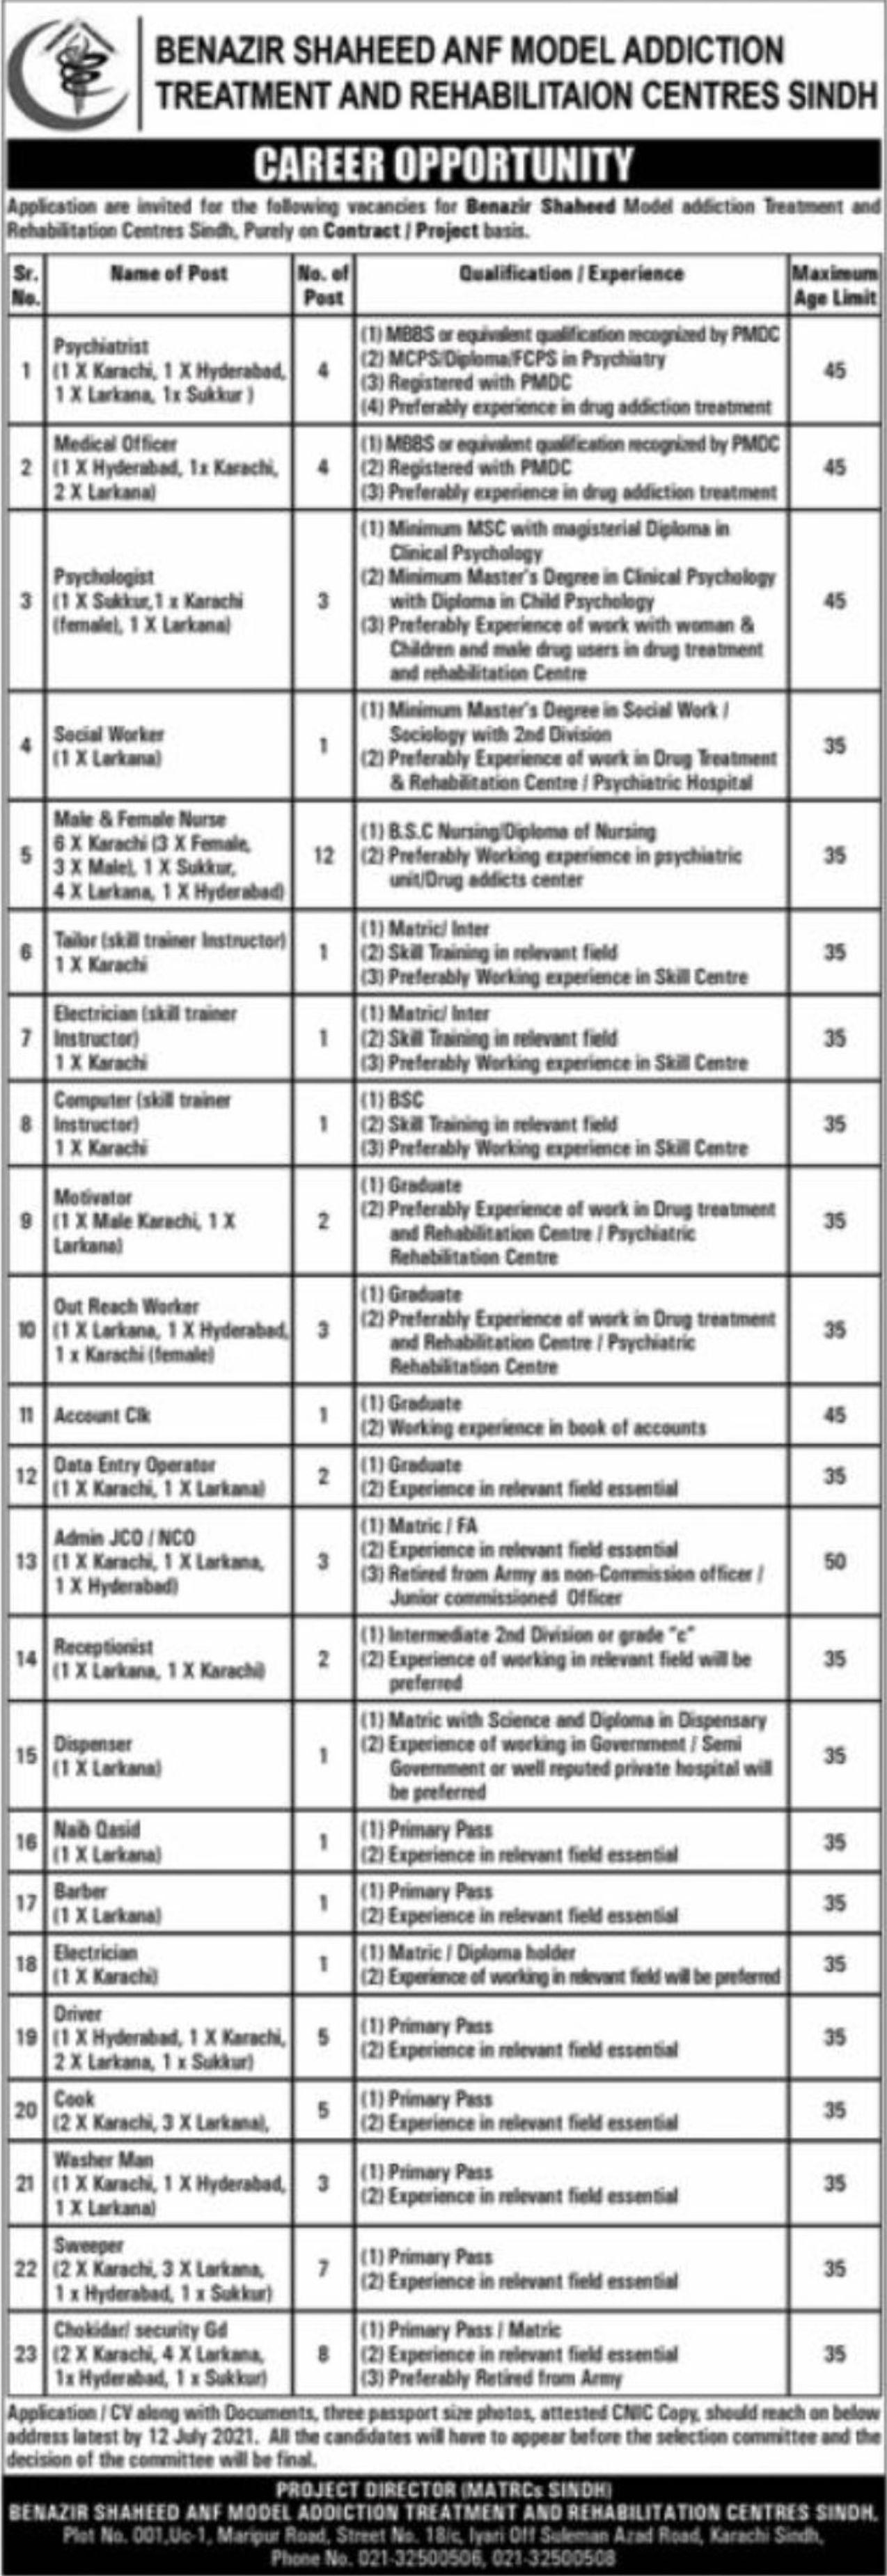 Benazir Shaheed ANF Model Addiction Treatment and Rehabilitation Centers Sindh Vacancies 2021| Dailyjobs.pk 3